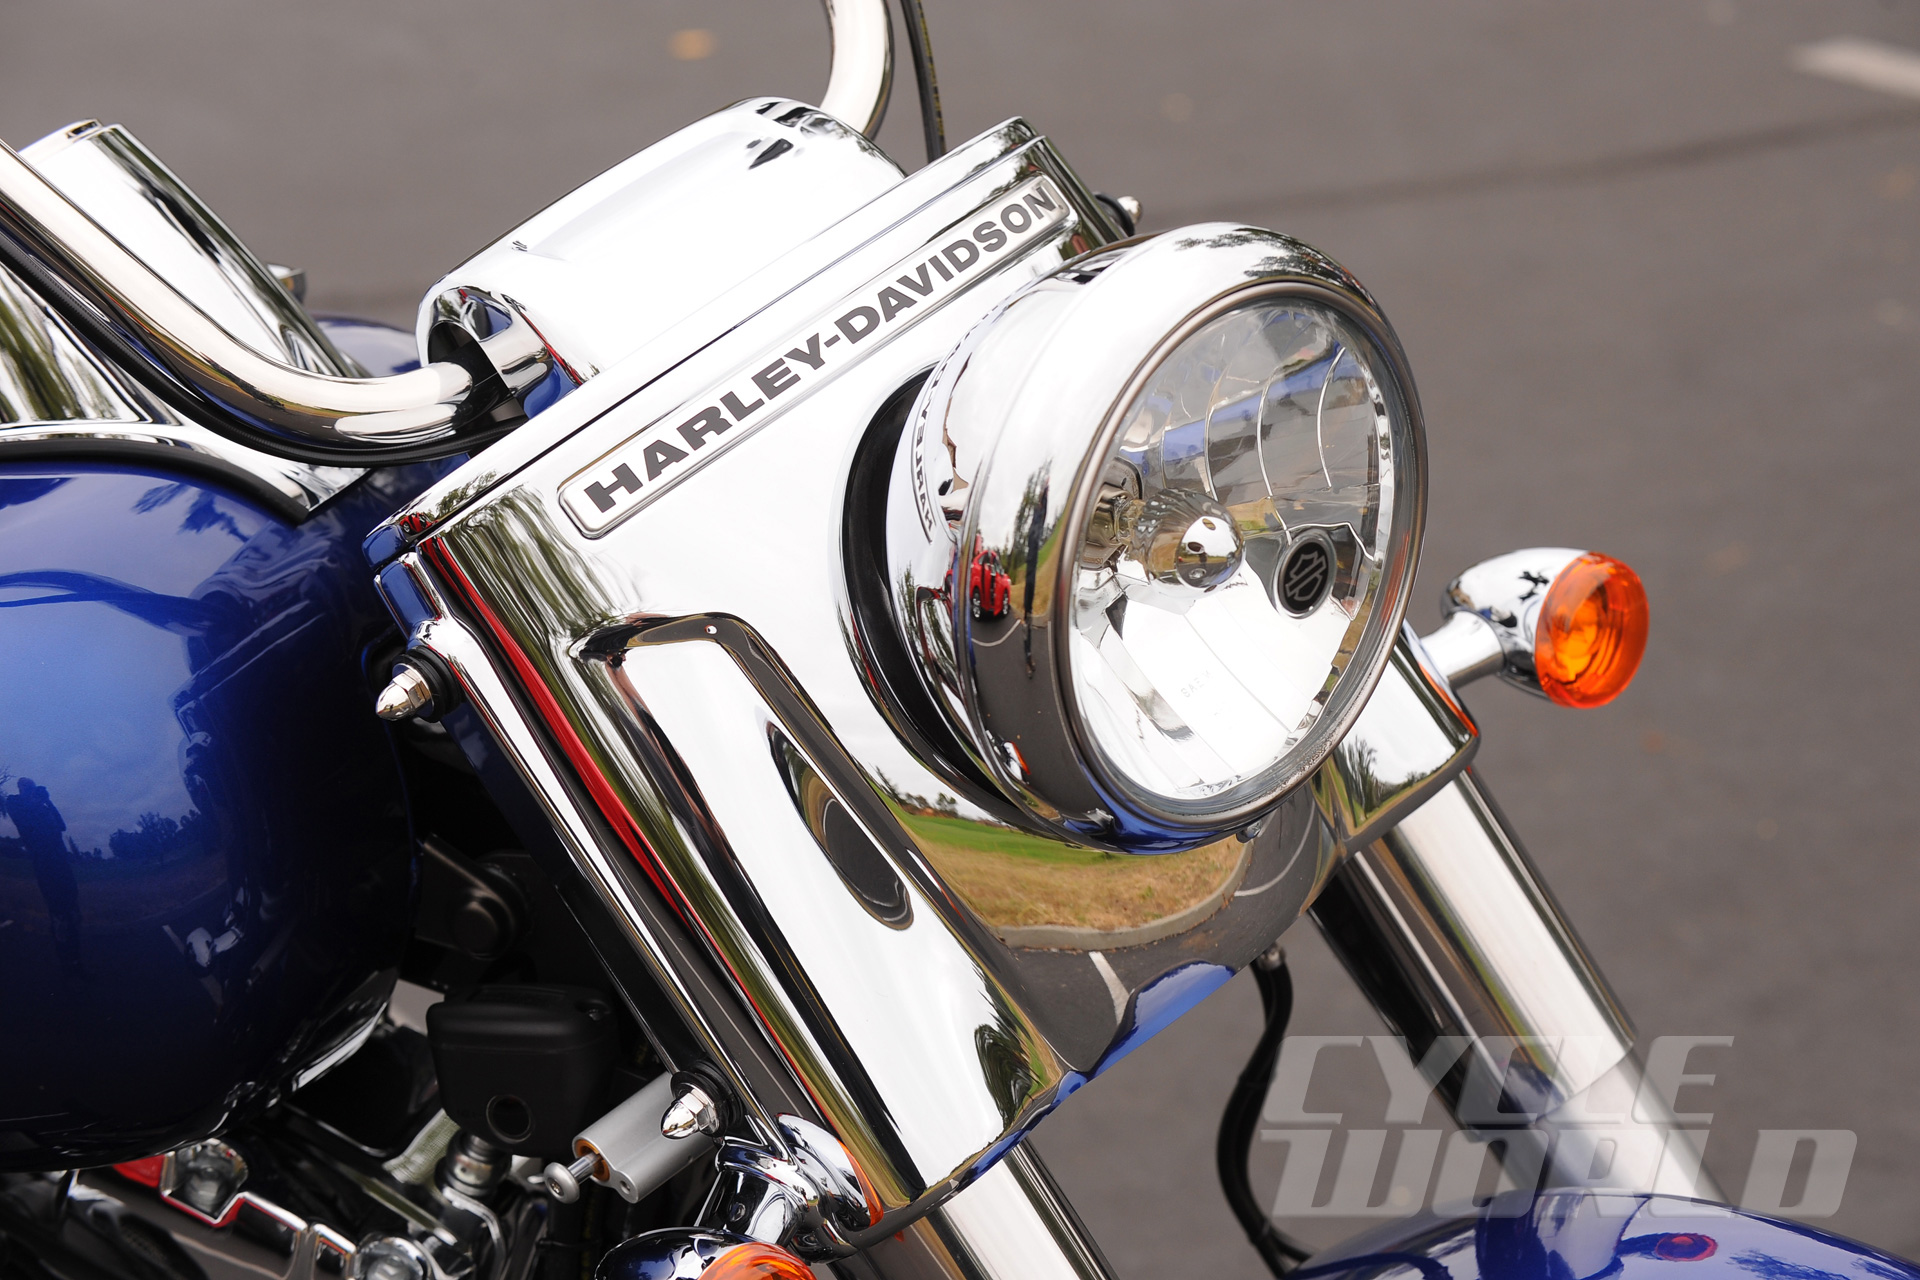 2015 Harley Davidson Trike, Harley Davidson Freewheeler   Cycle World